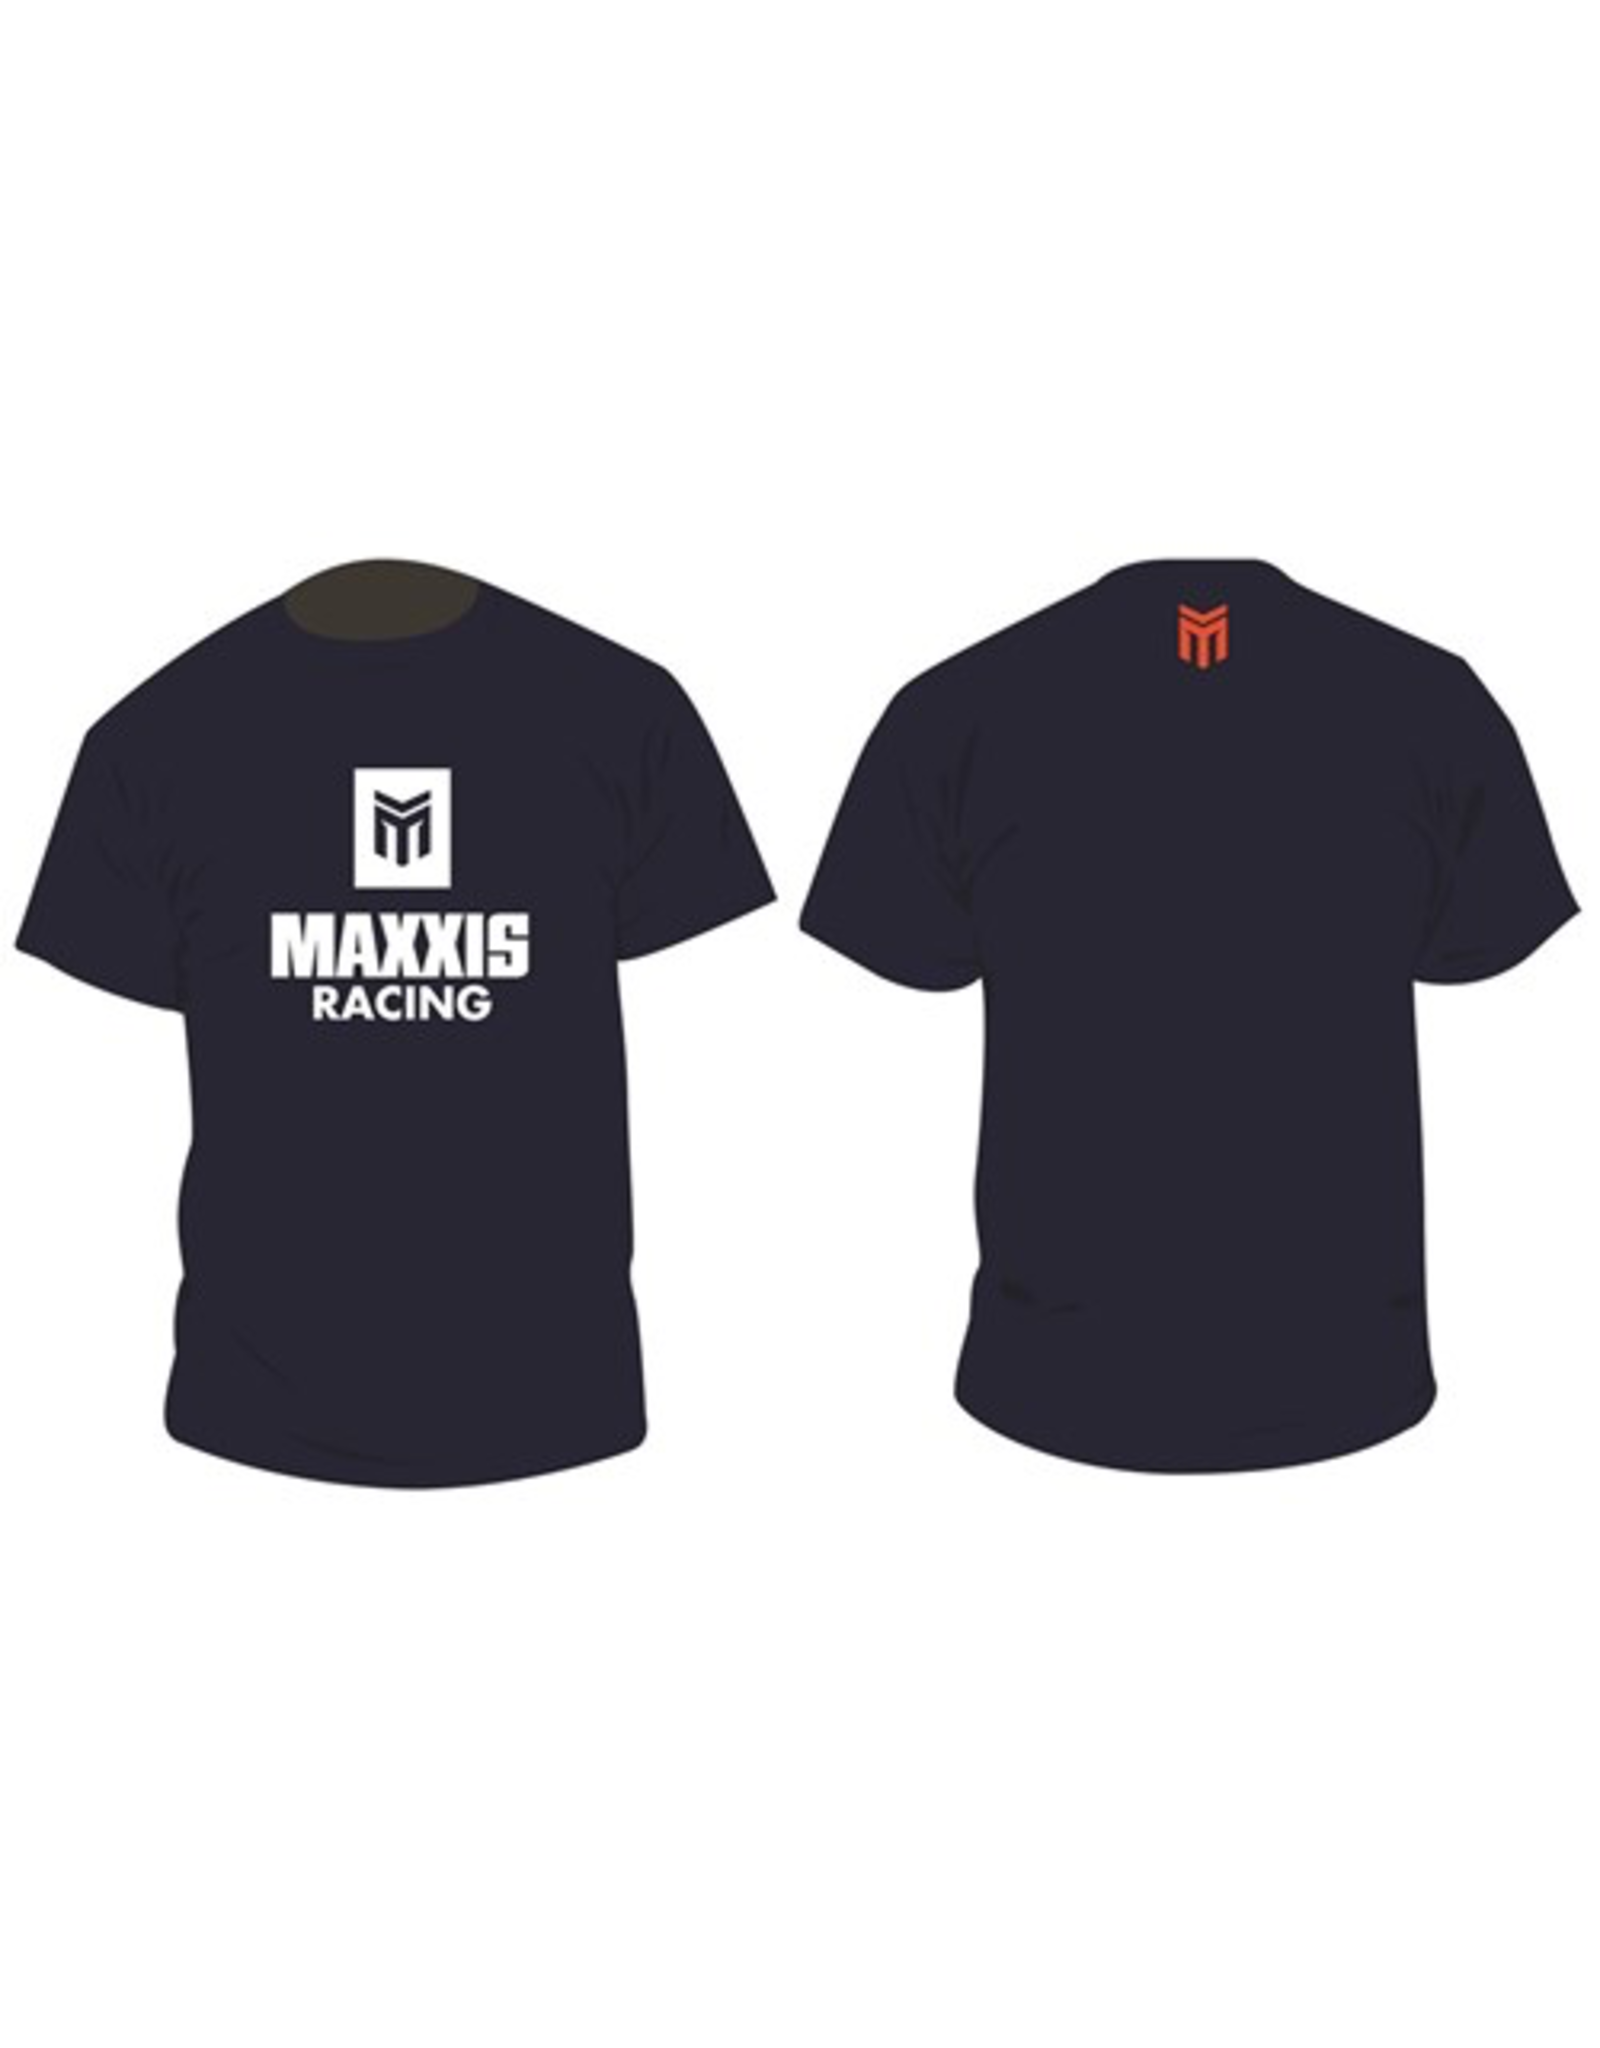 MAXXIS MAXXIS RACING T-SHIRT